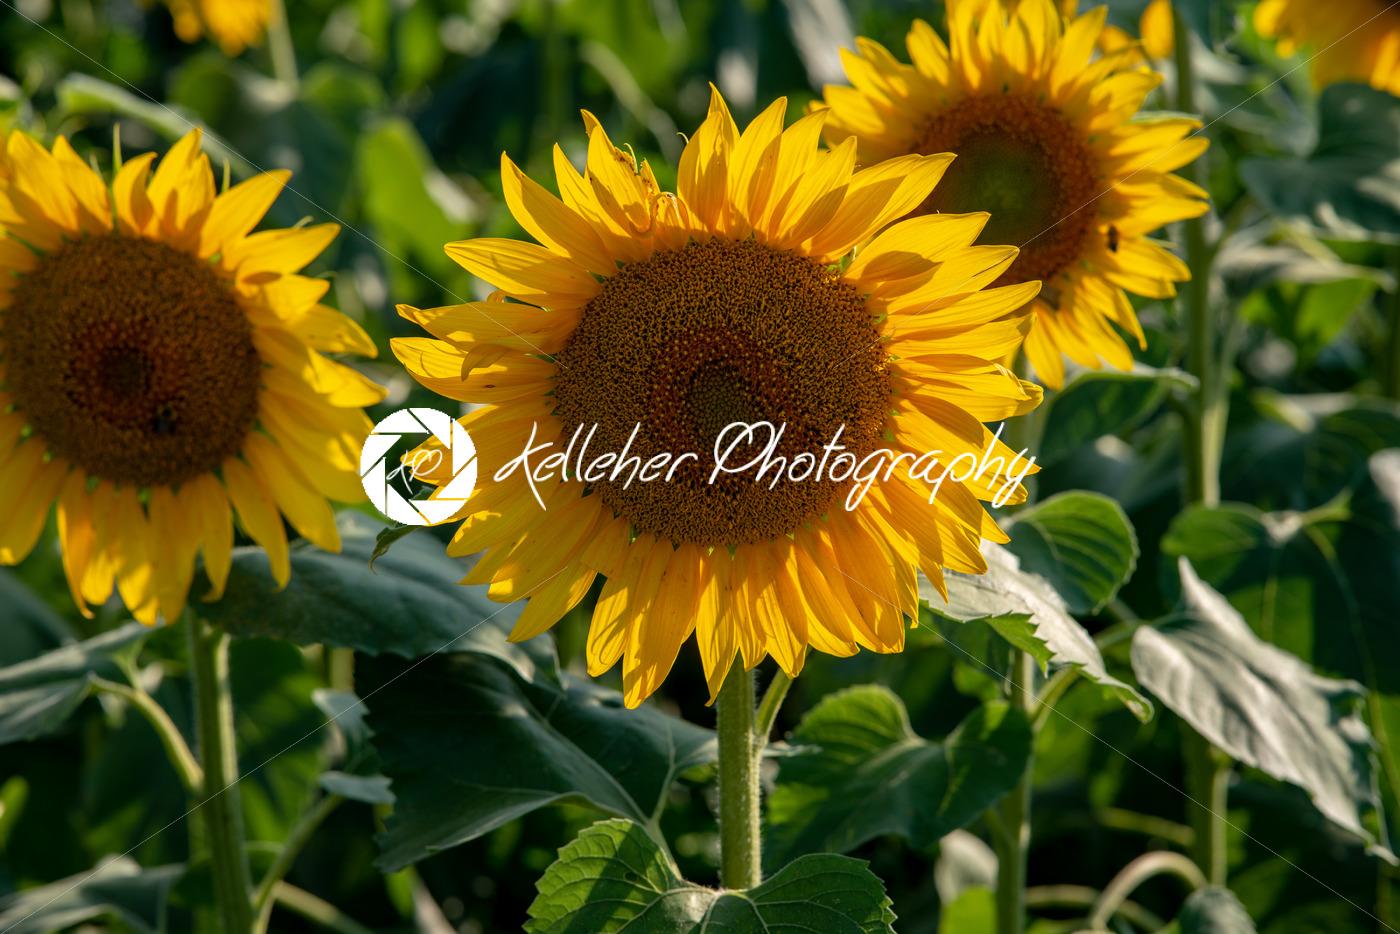 Sun flower Field during sunset hour - Kelleher Photography Store